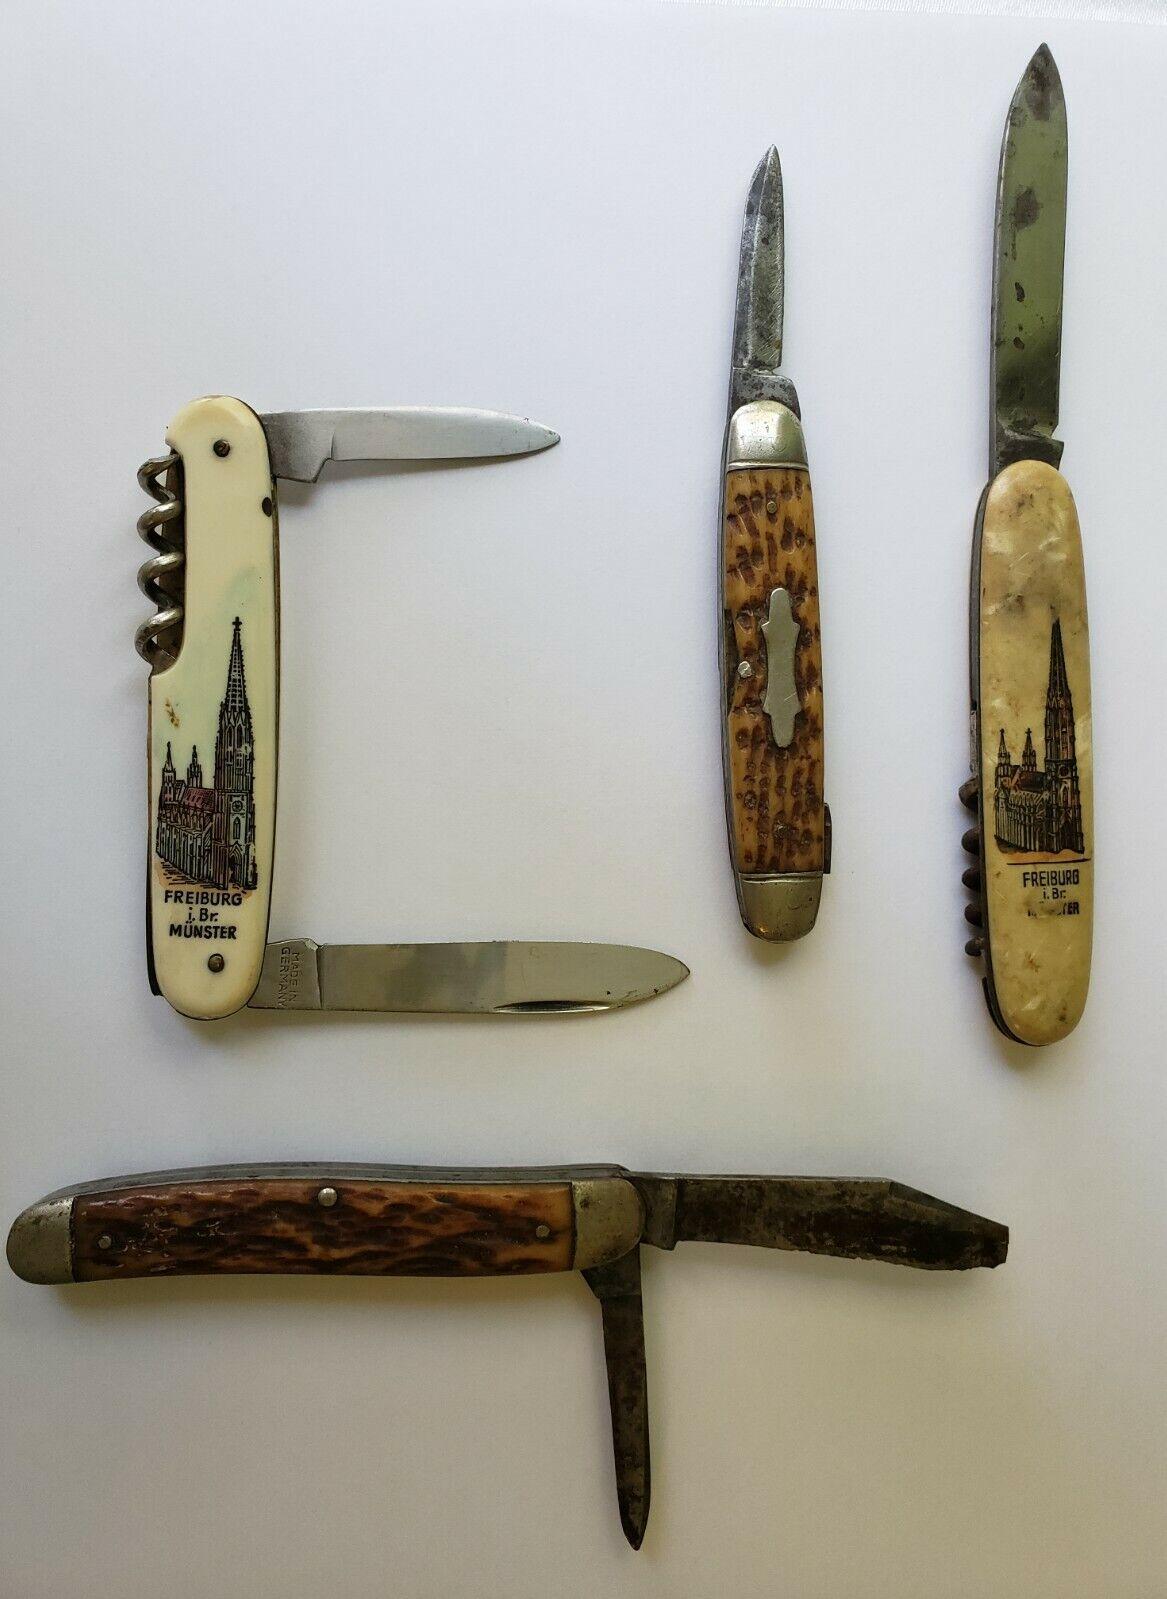 Lot Of 4 Vtg Pocket Knives Remington UMC, Hibbard Spencer, Foreign, Freiburg...